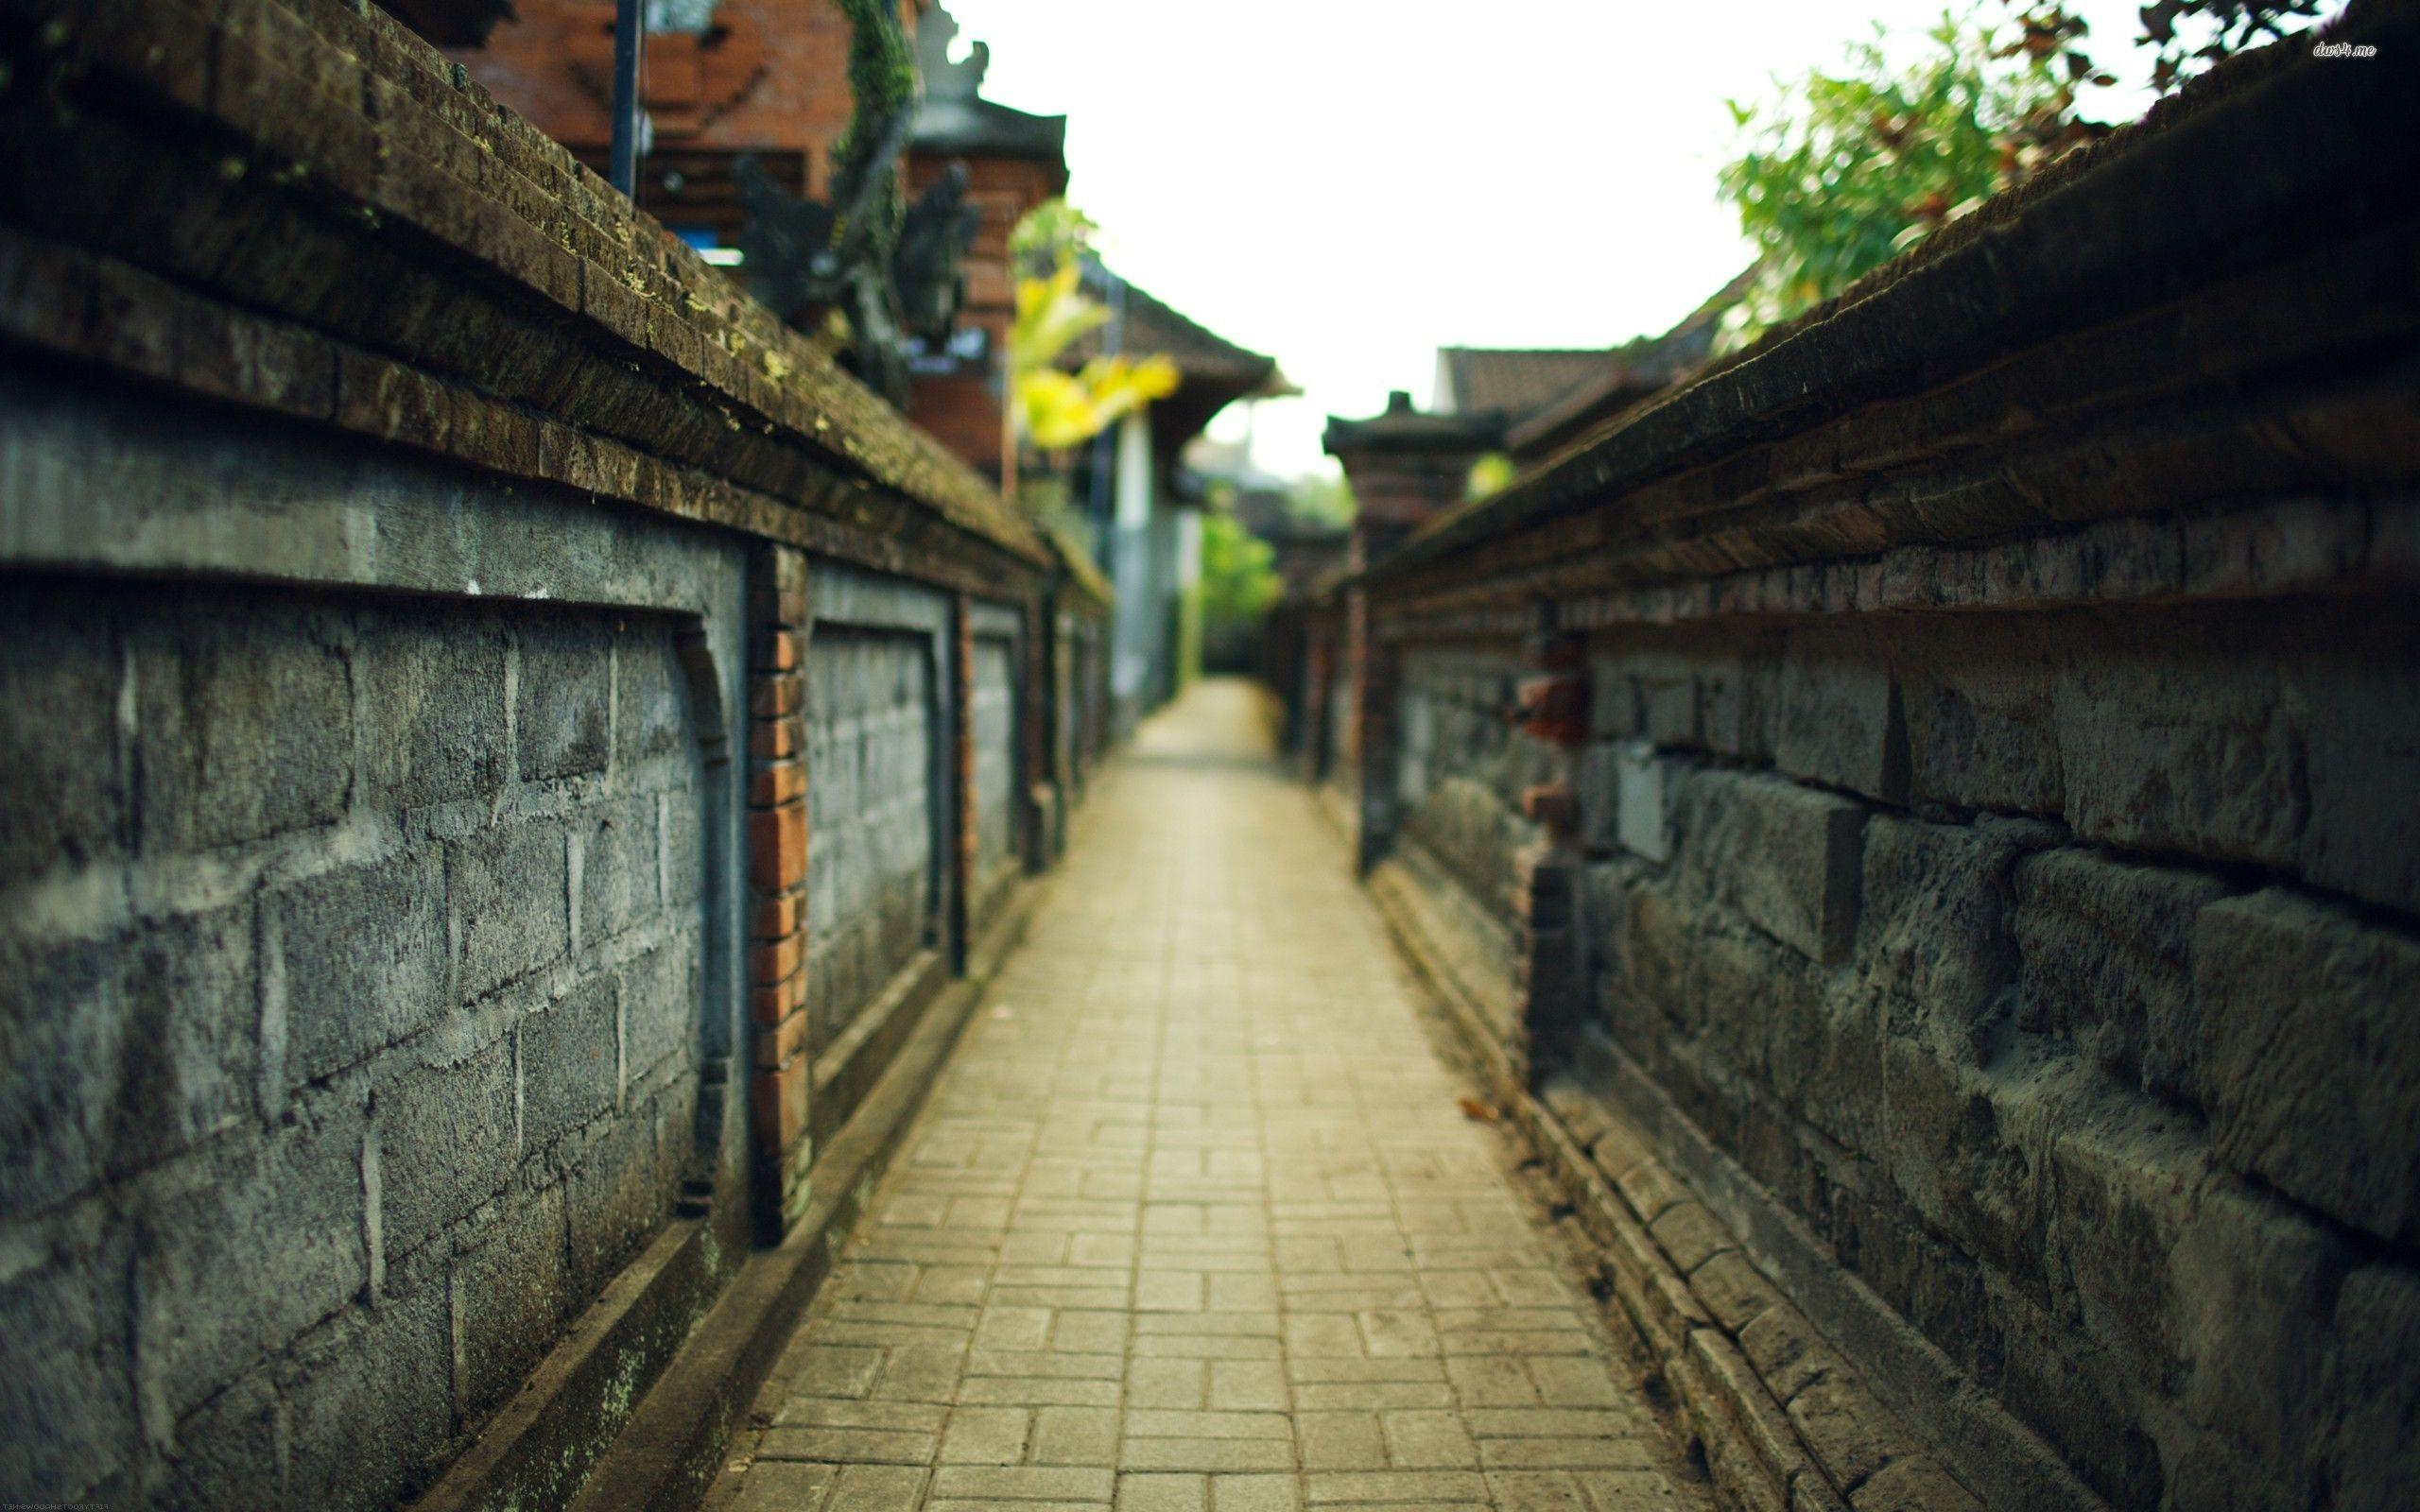 narrow-city-alley-street-world-2560x1600-wallpaper10049 2,560